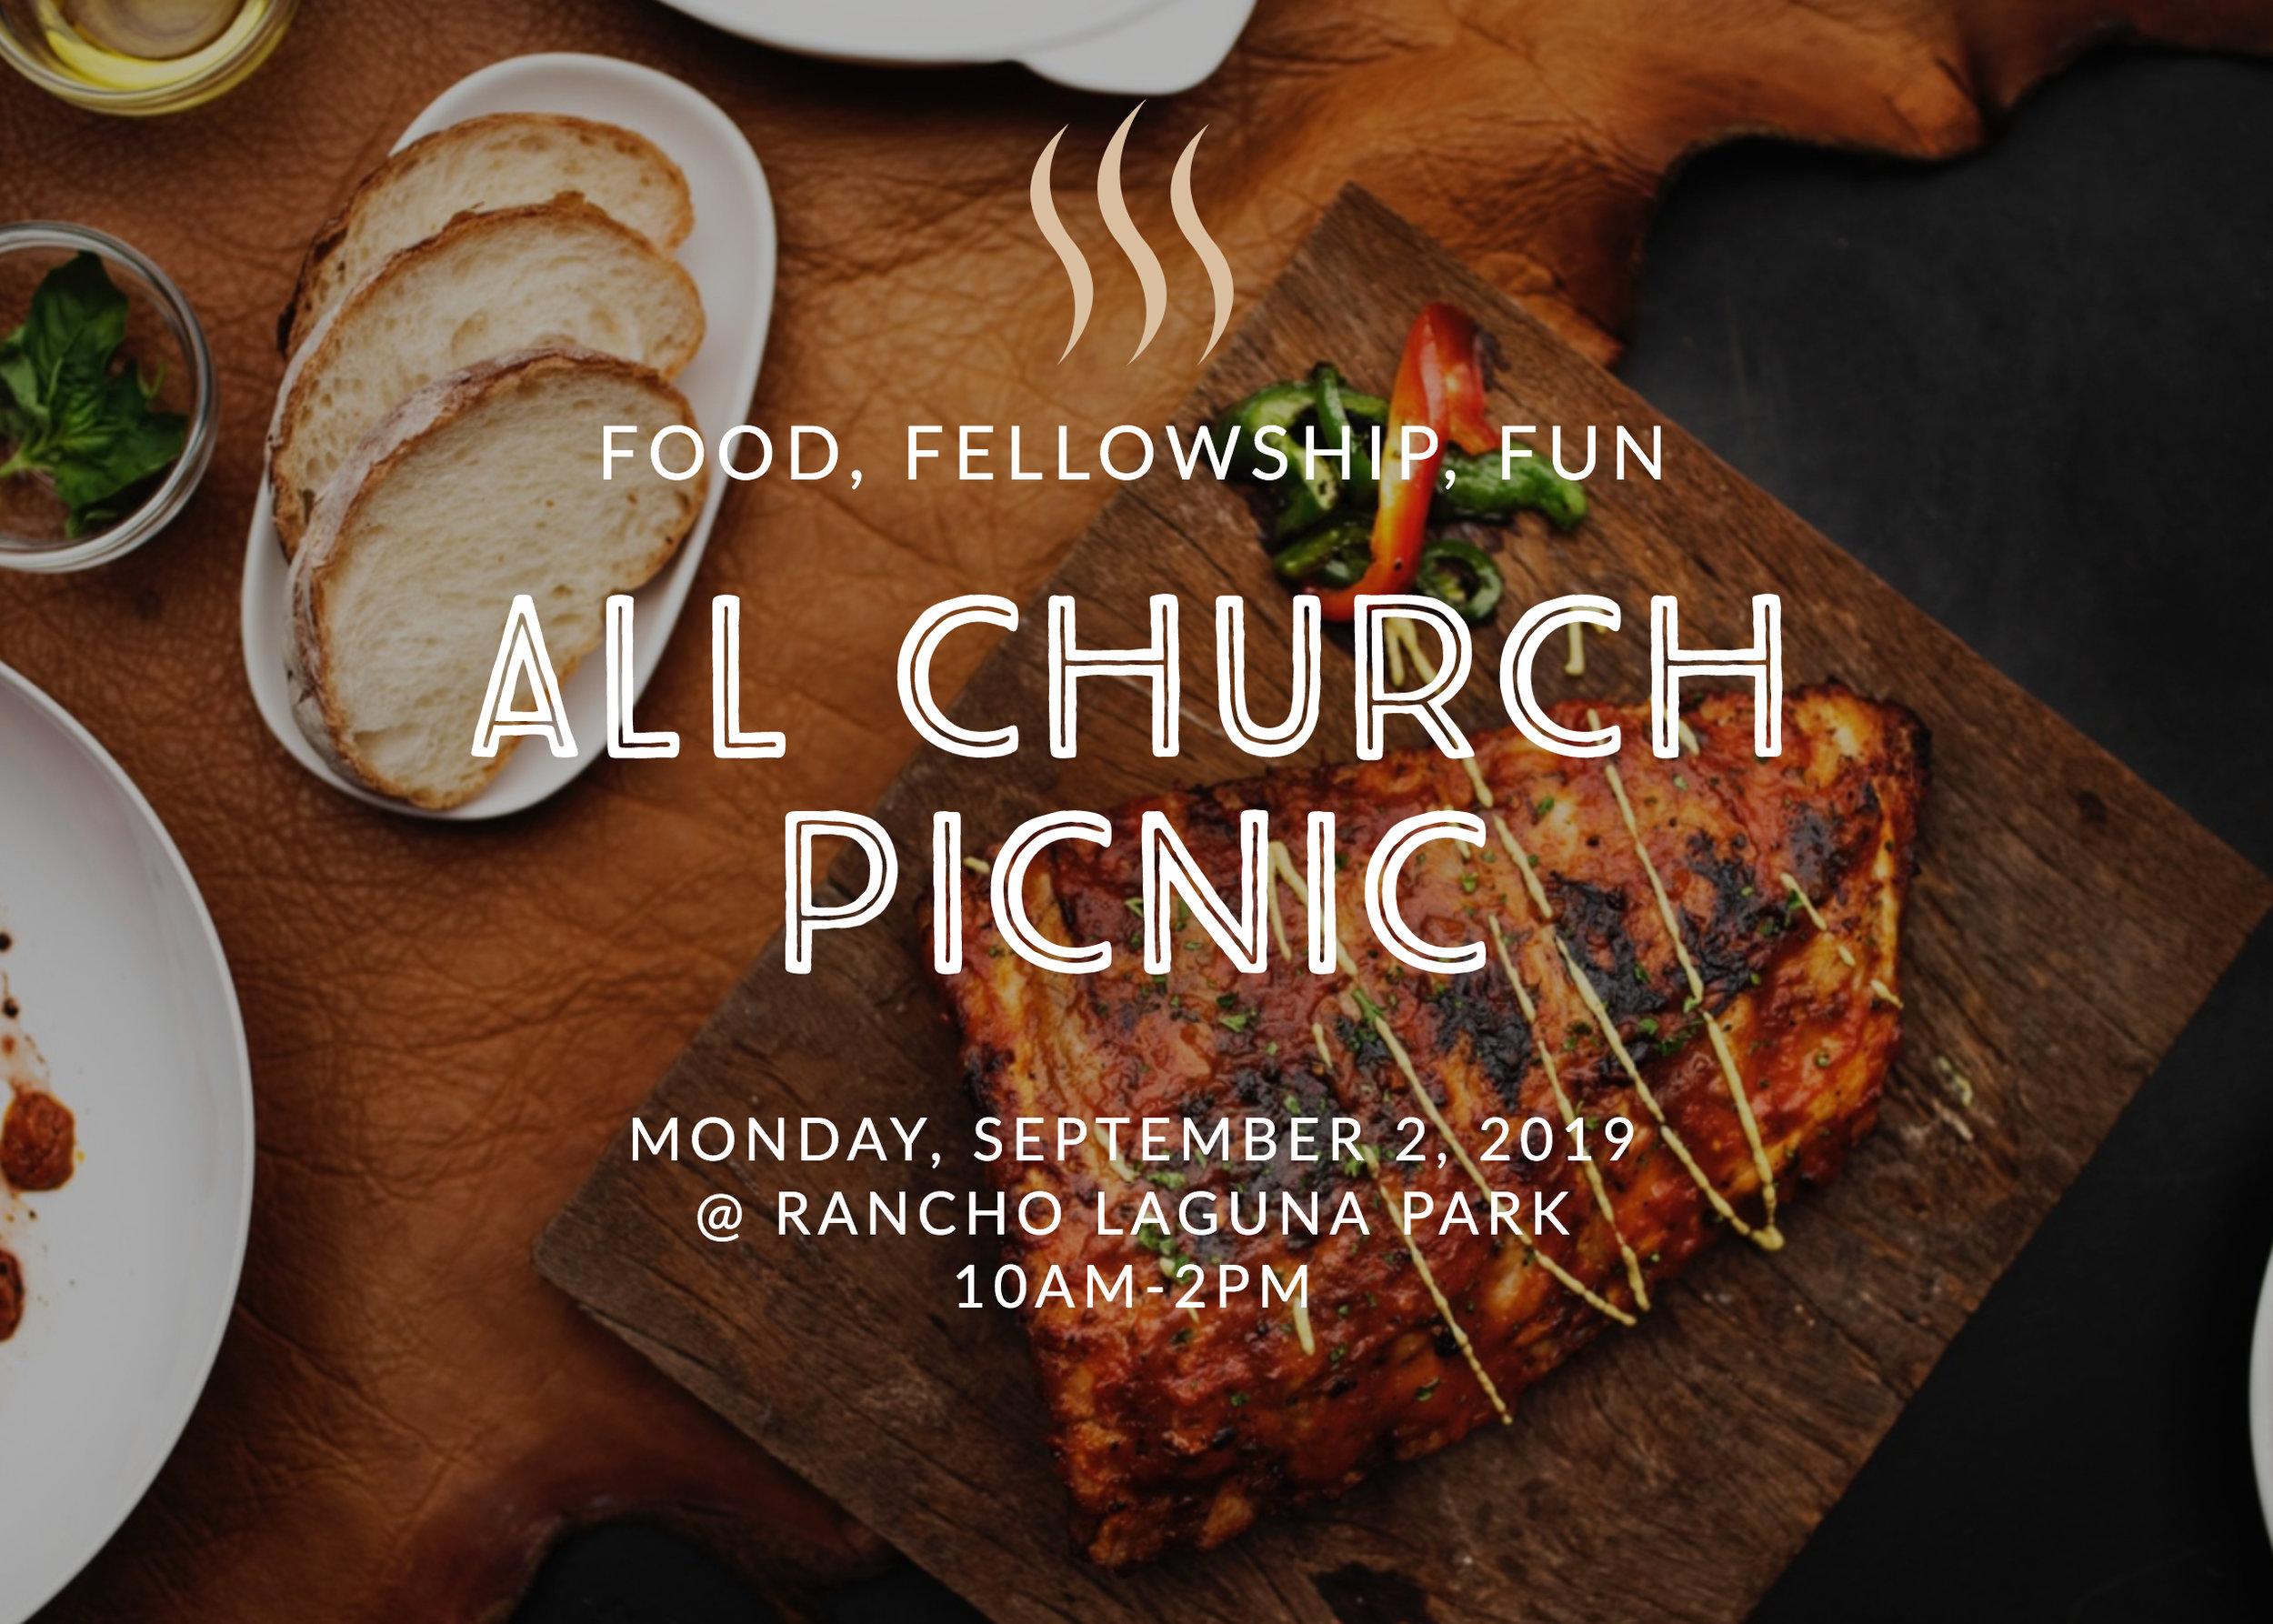 all curch picnic.jpg